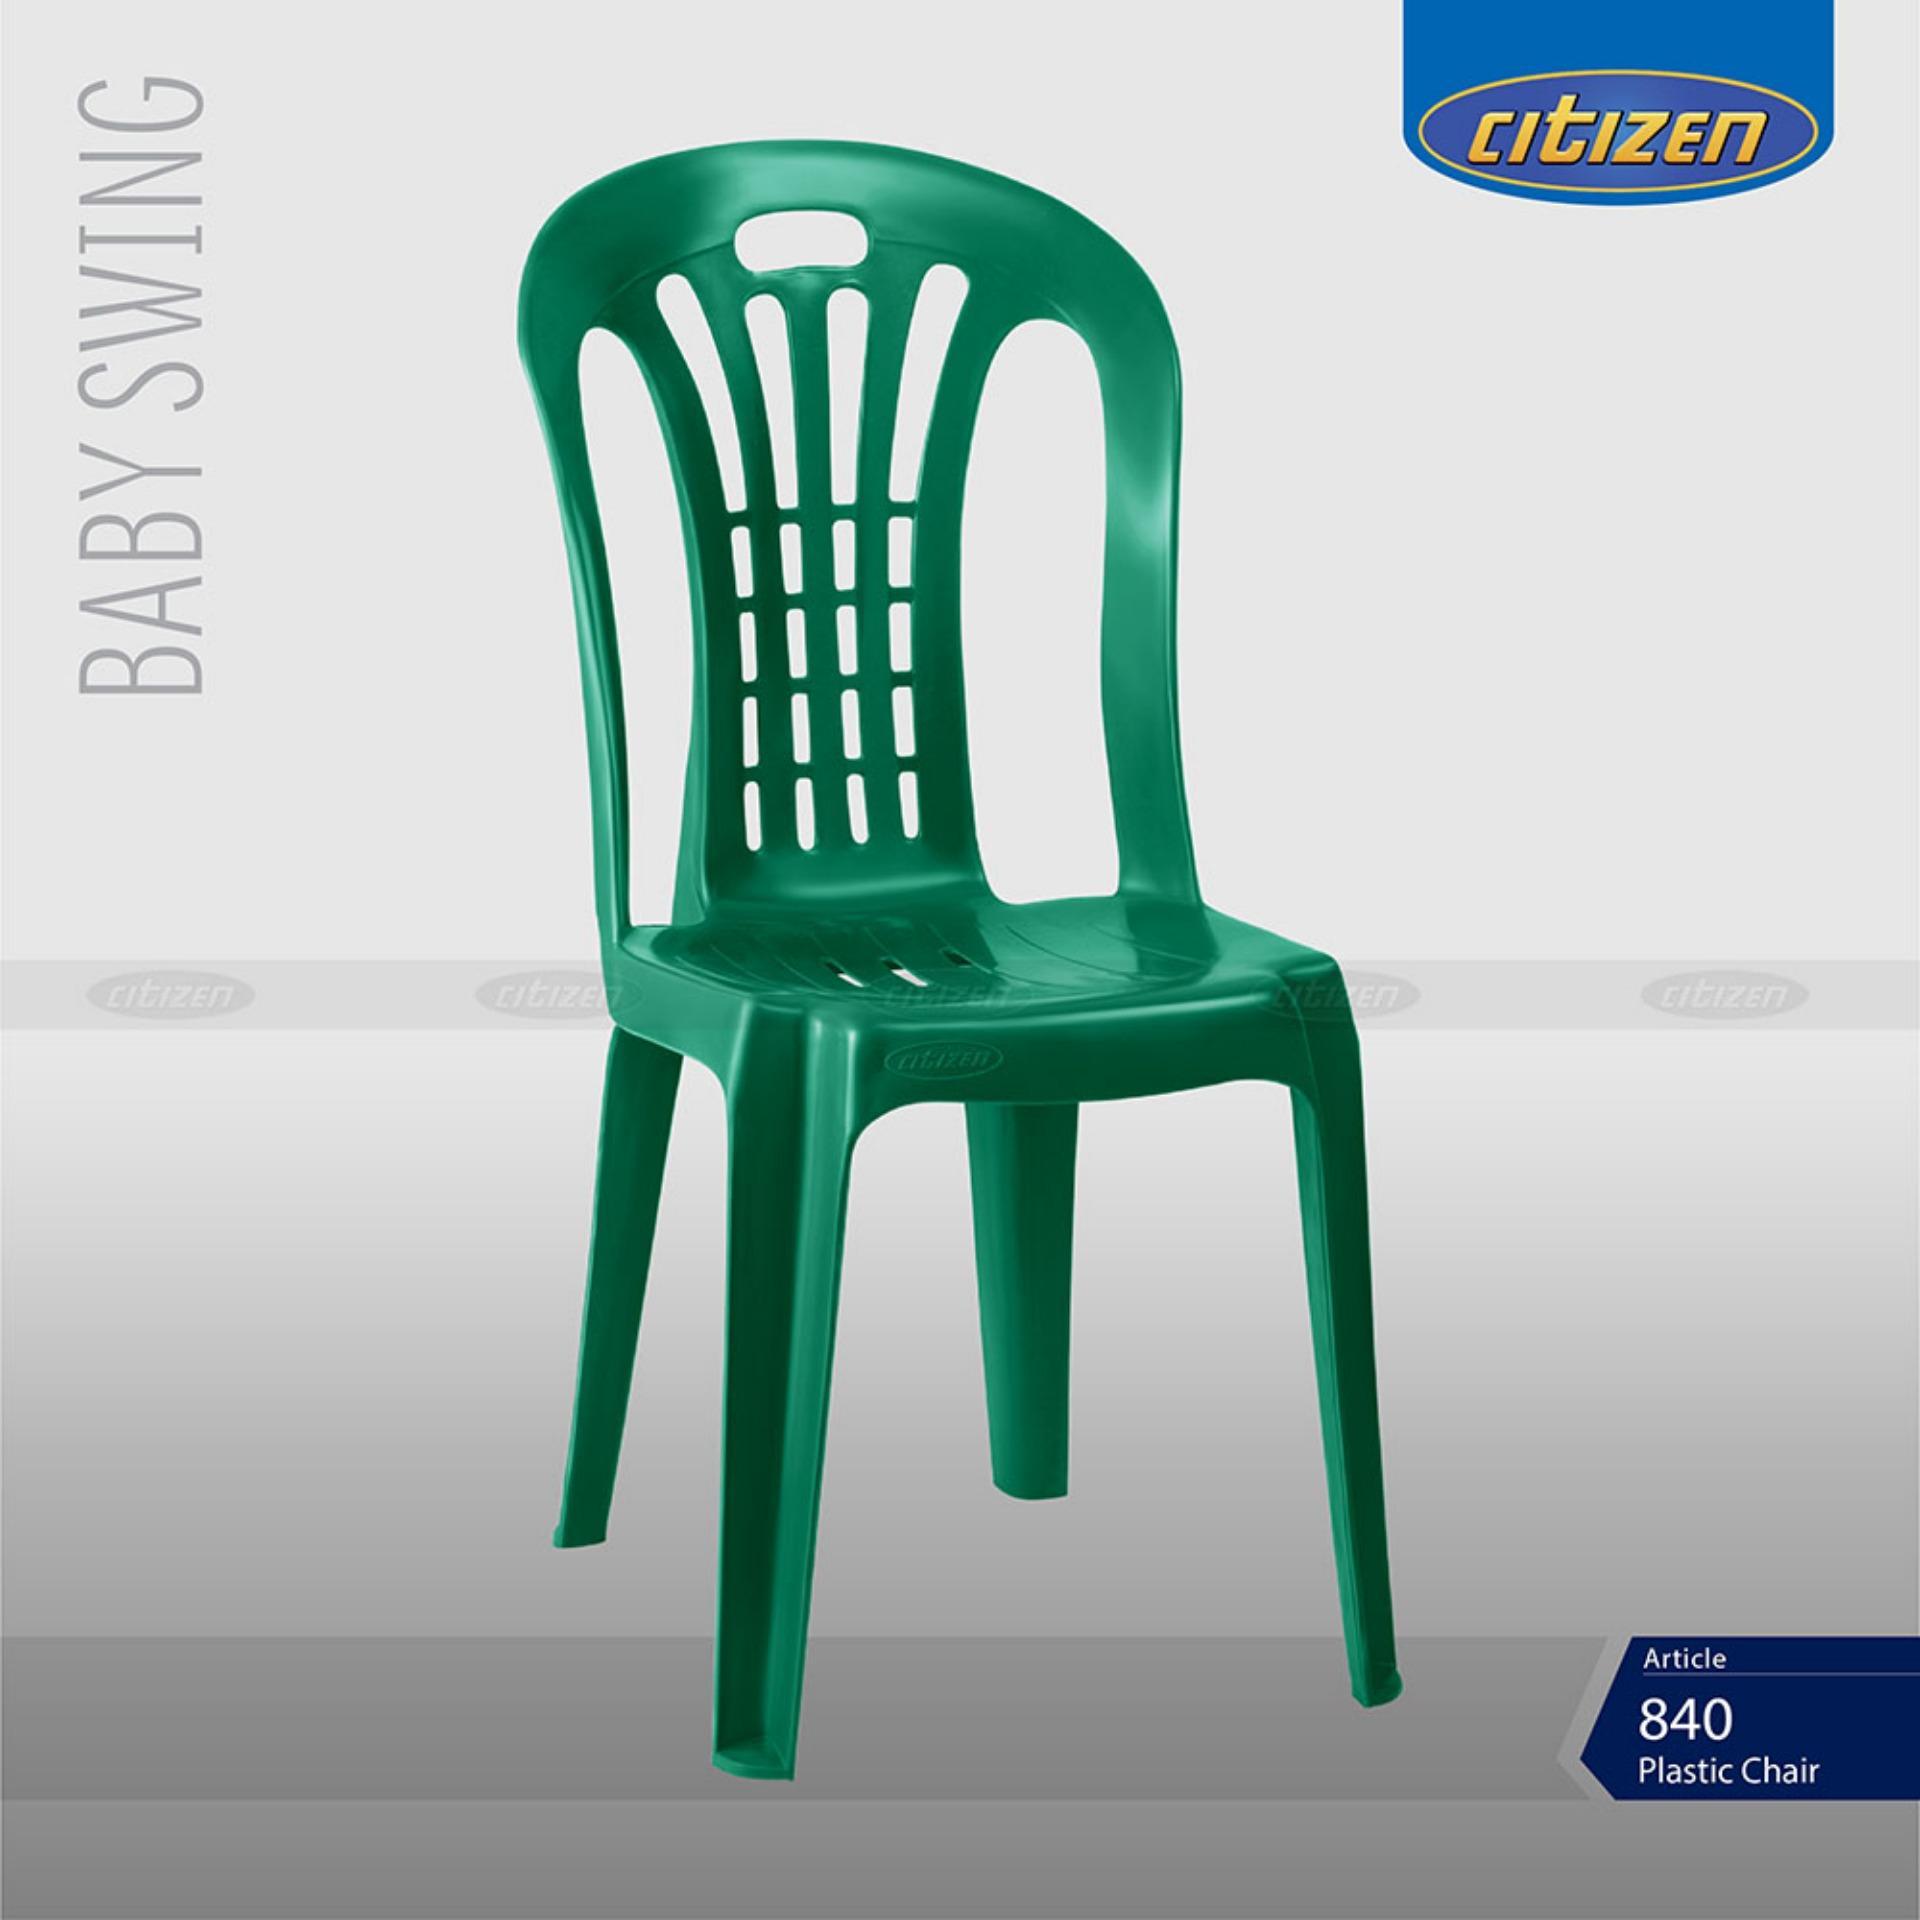 Citizen Plastic Furniture Pakistan Citizen Plastic Furniture